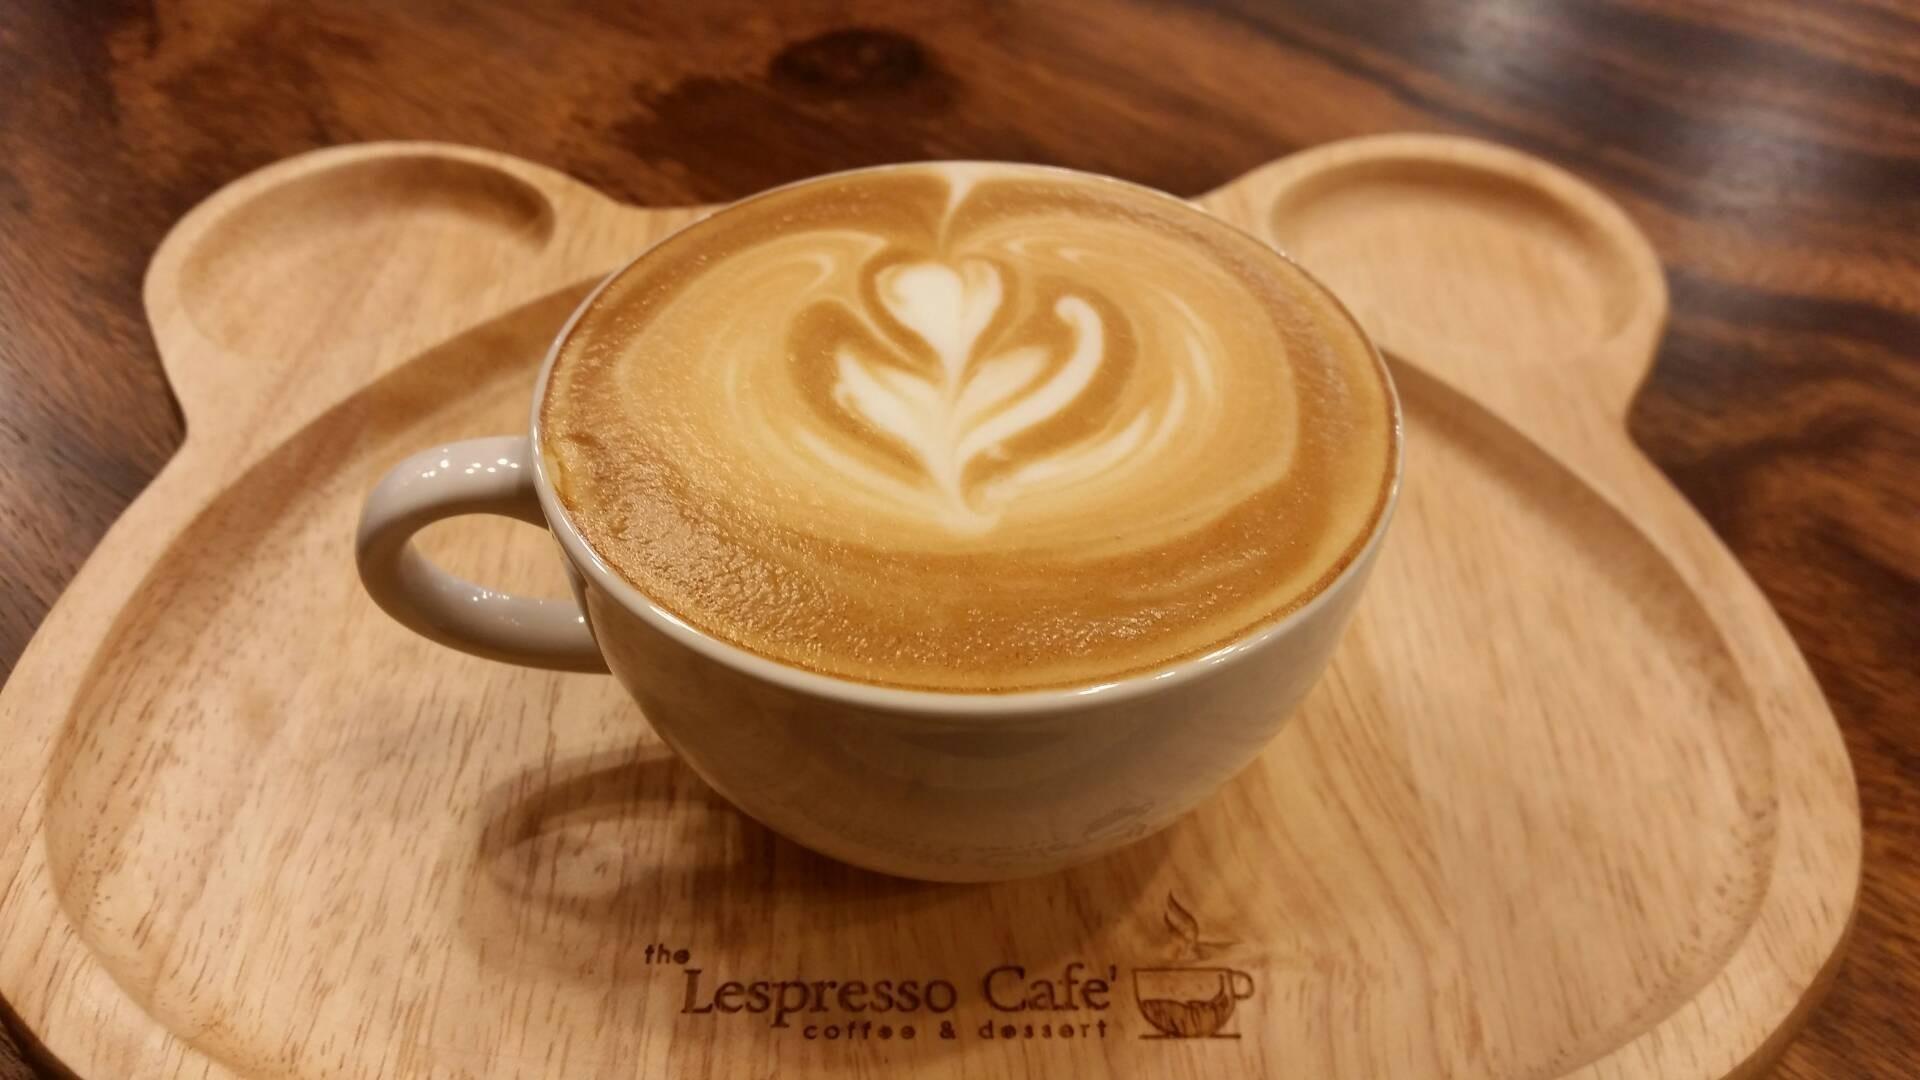 The Lespresso Cafe